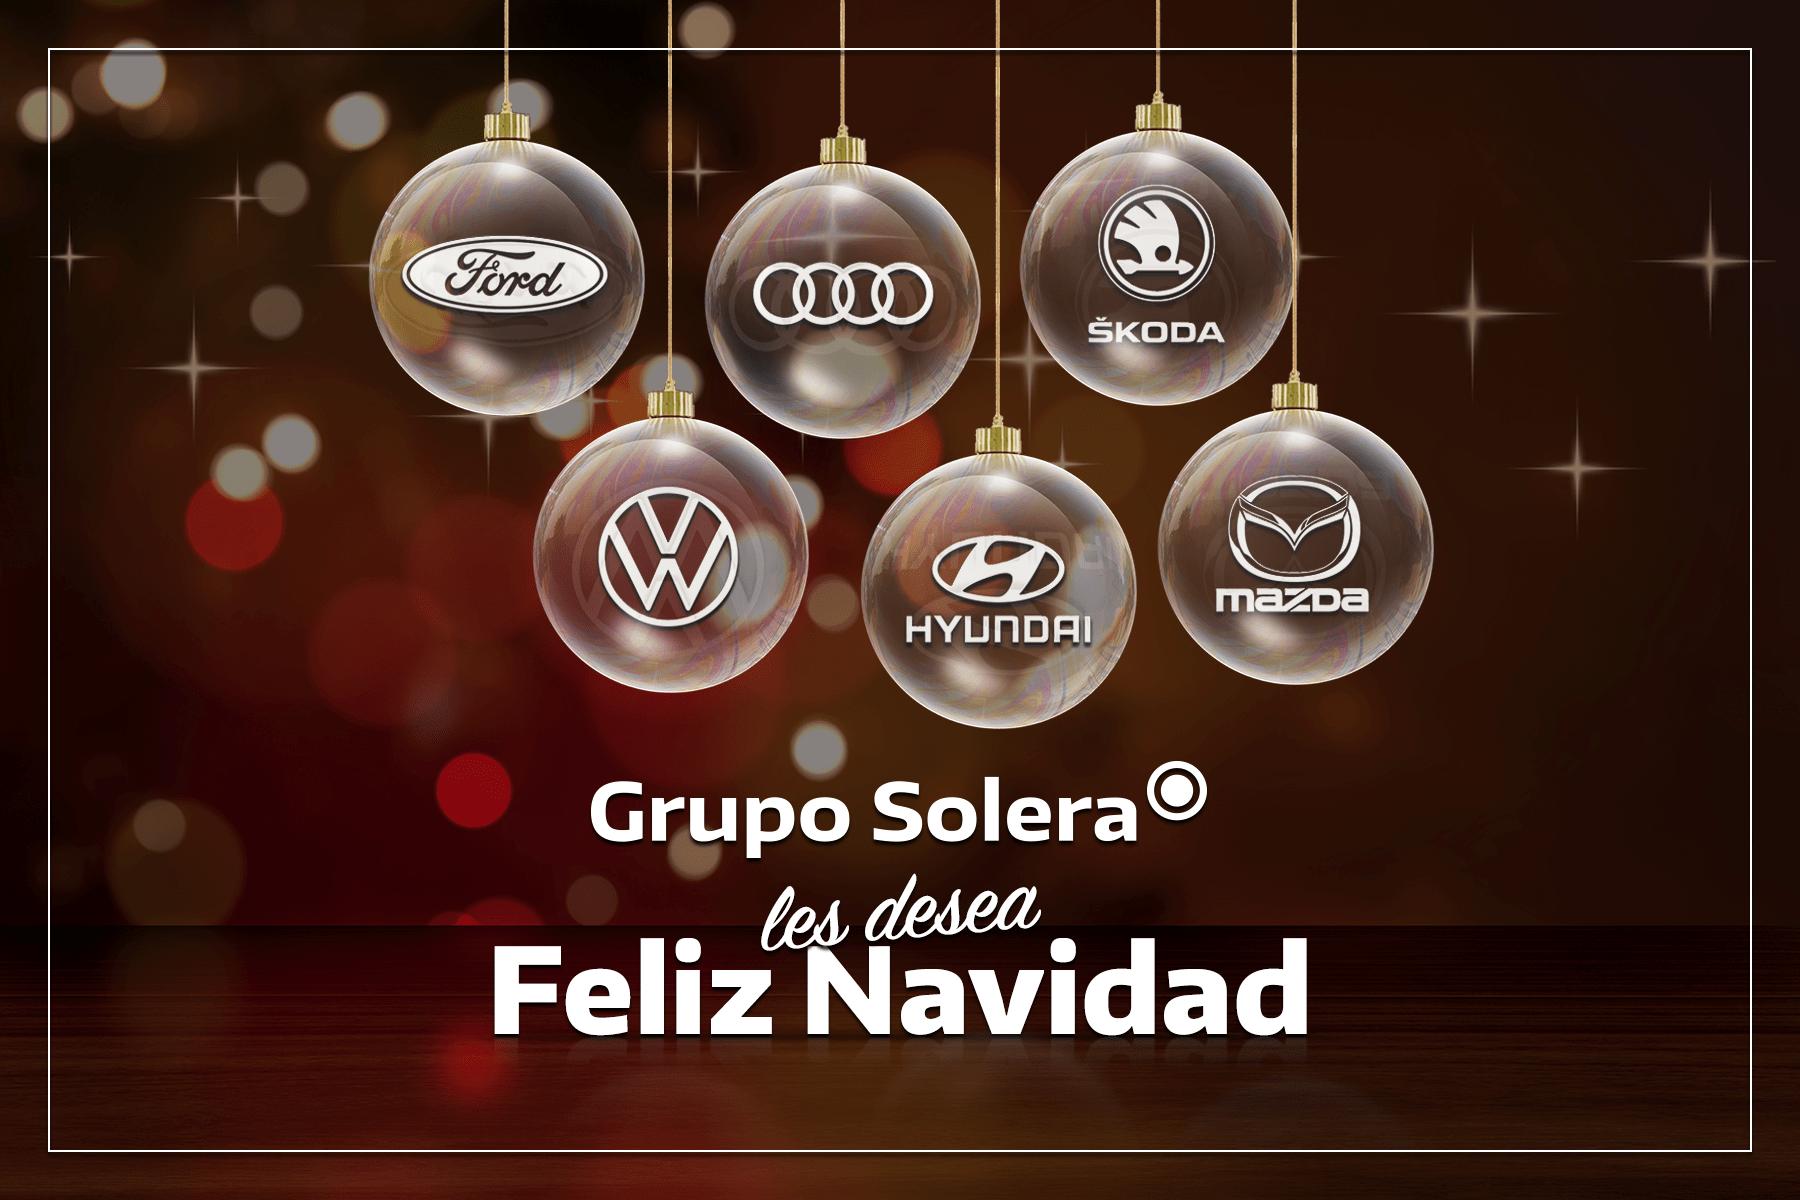 Grupo Solera les desea Feliz Navidad